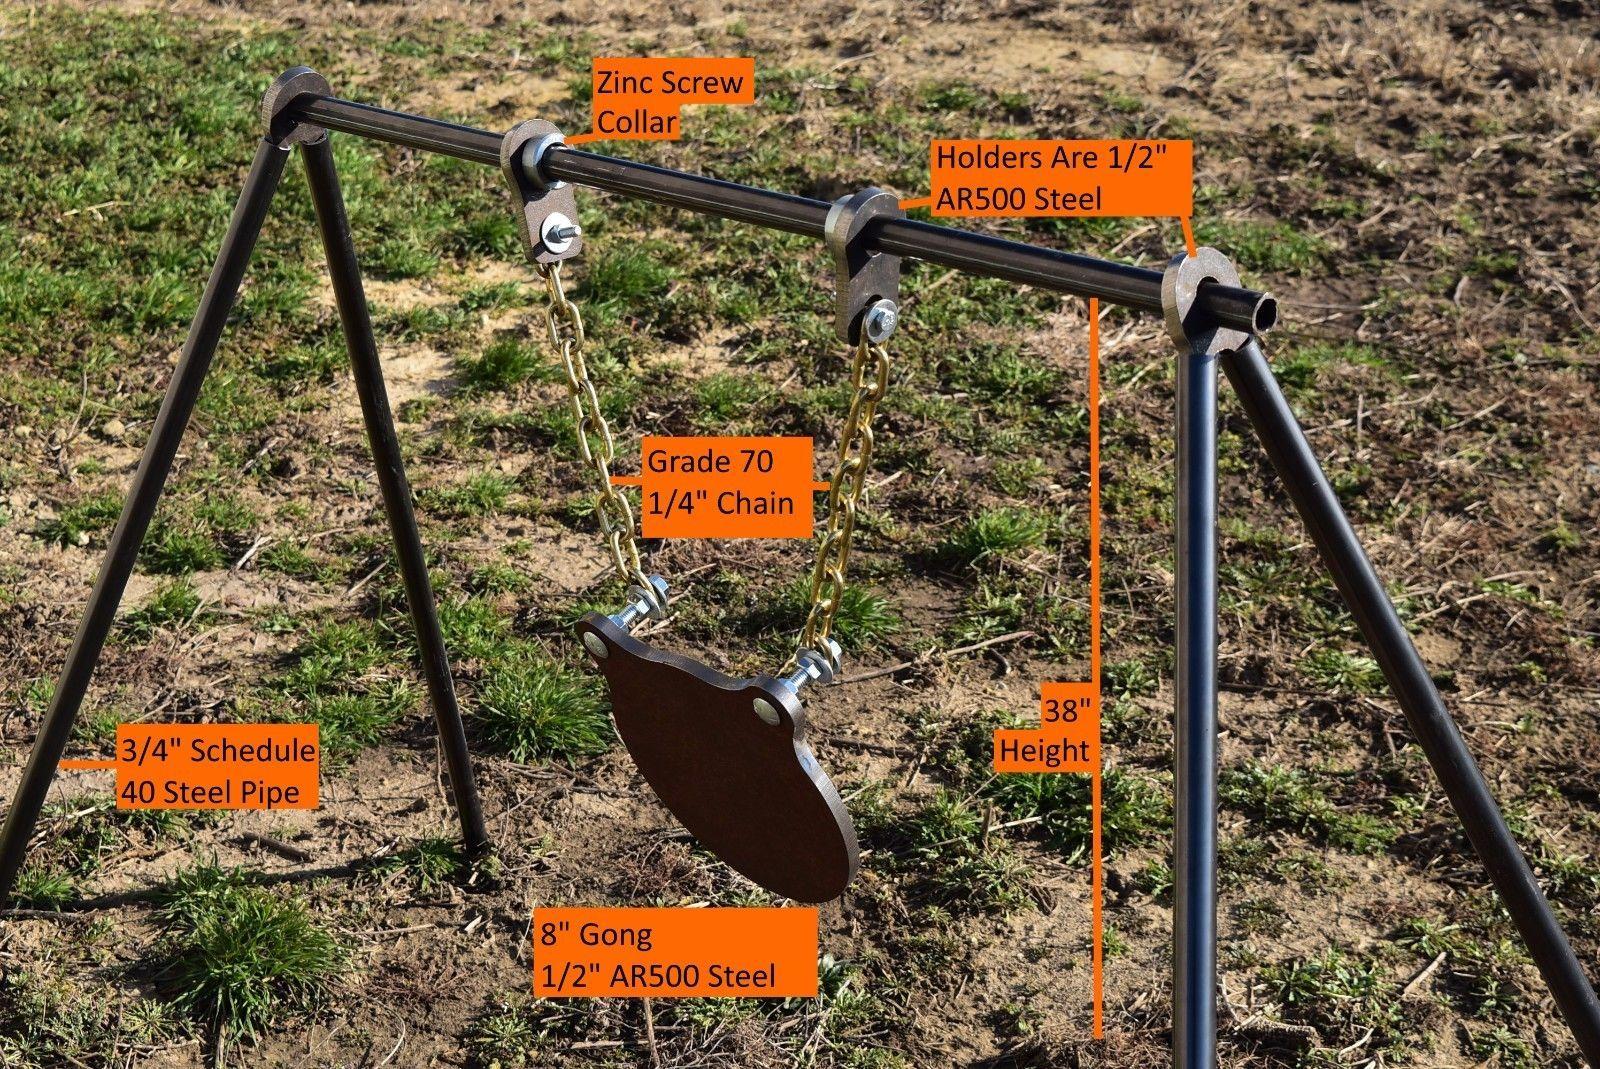 Gallery Swinging 6 Metal Targets Auto Reset Traps Shooting Spinning Target